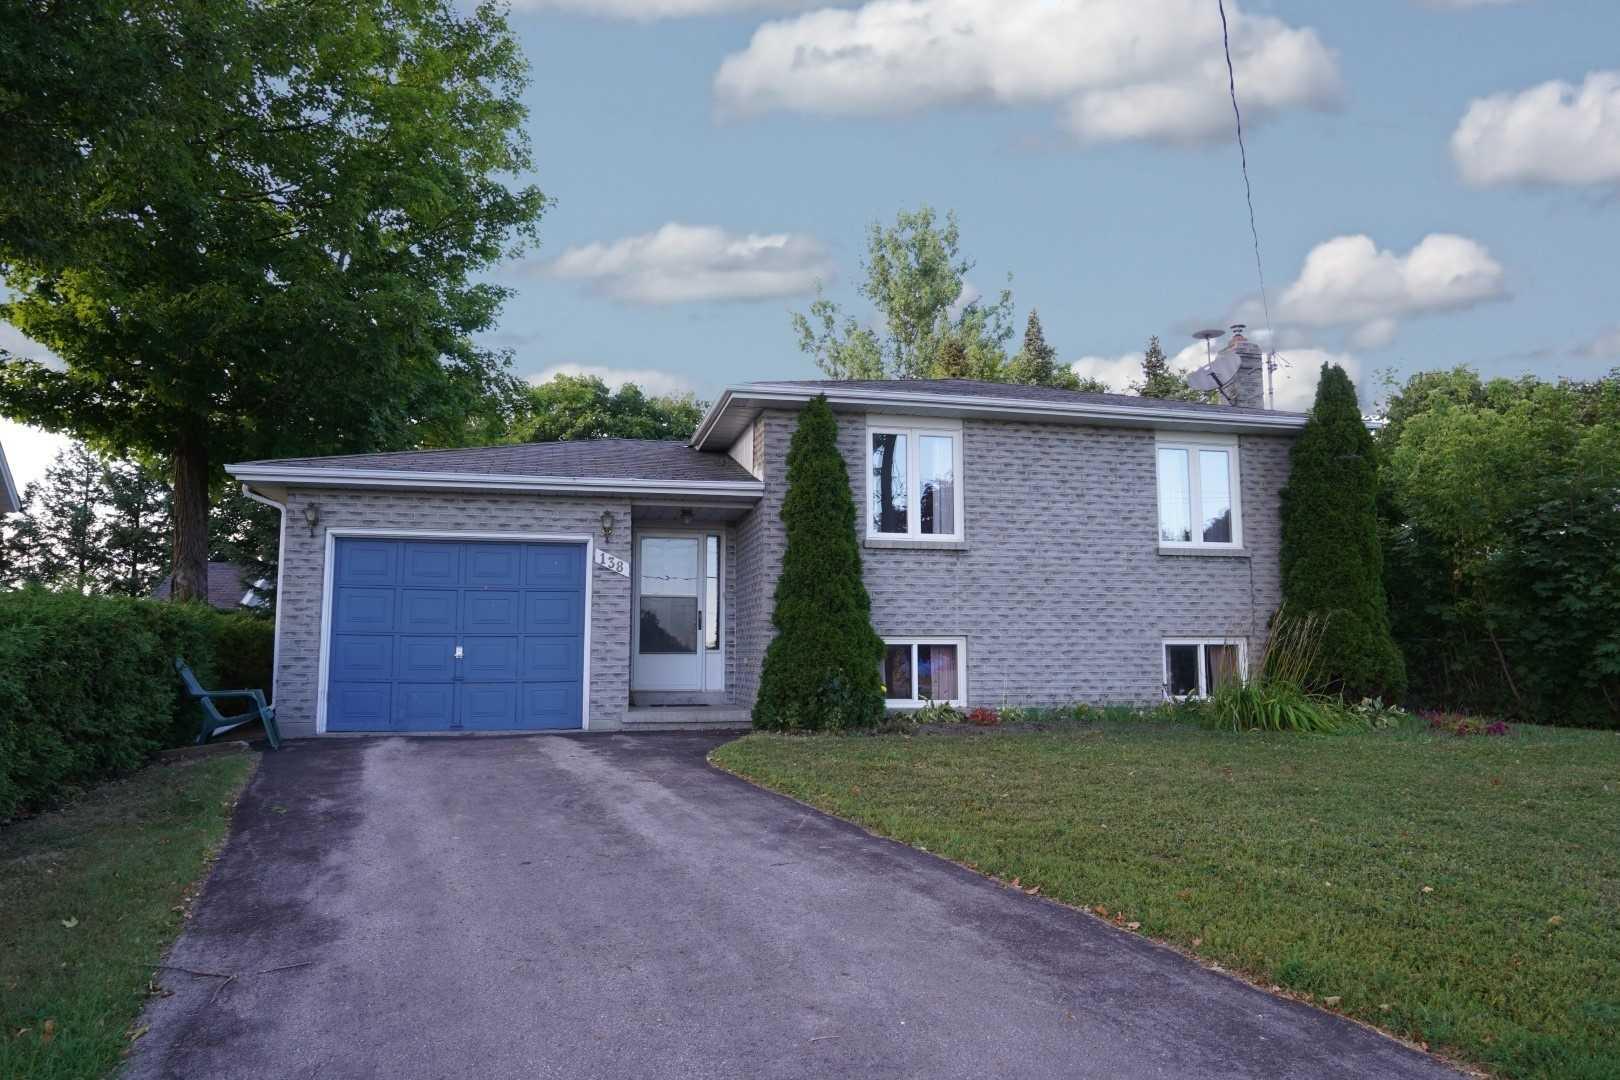 138 King St, Kawartha Lakes Ontario, Canada